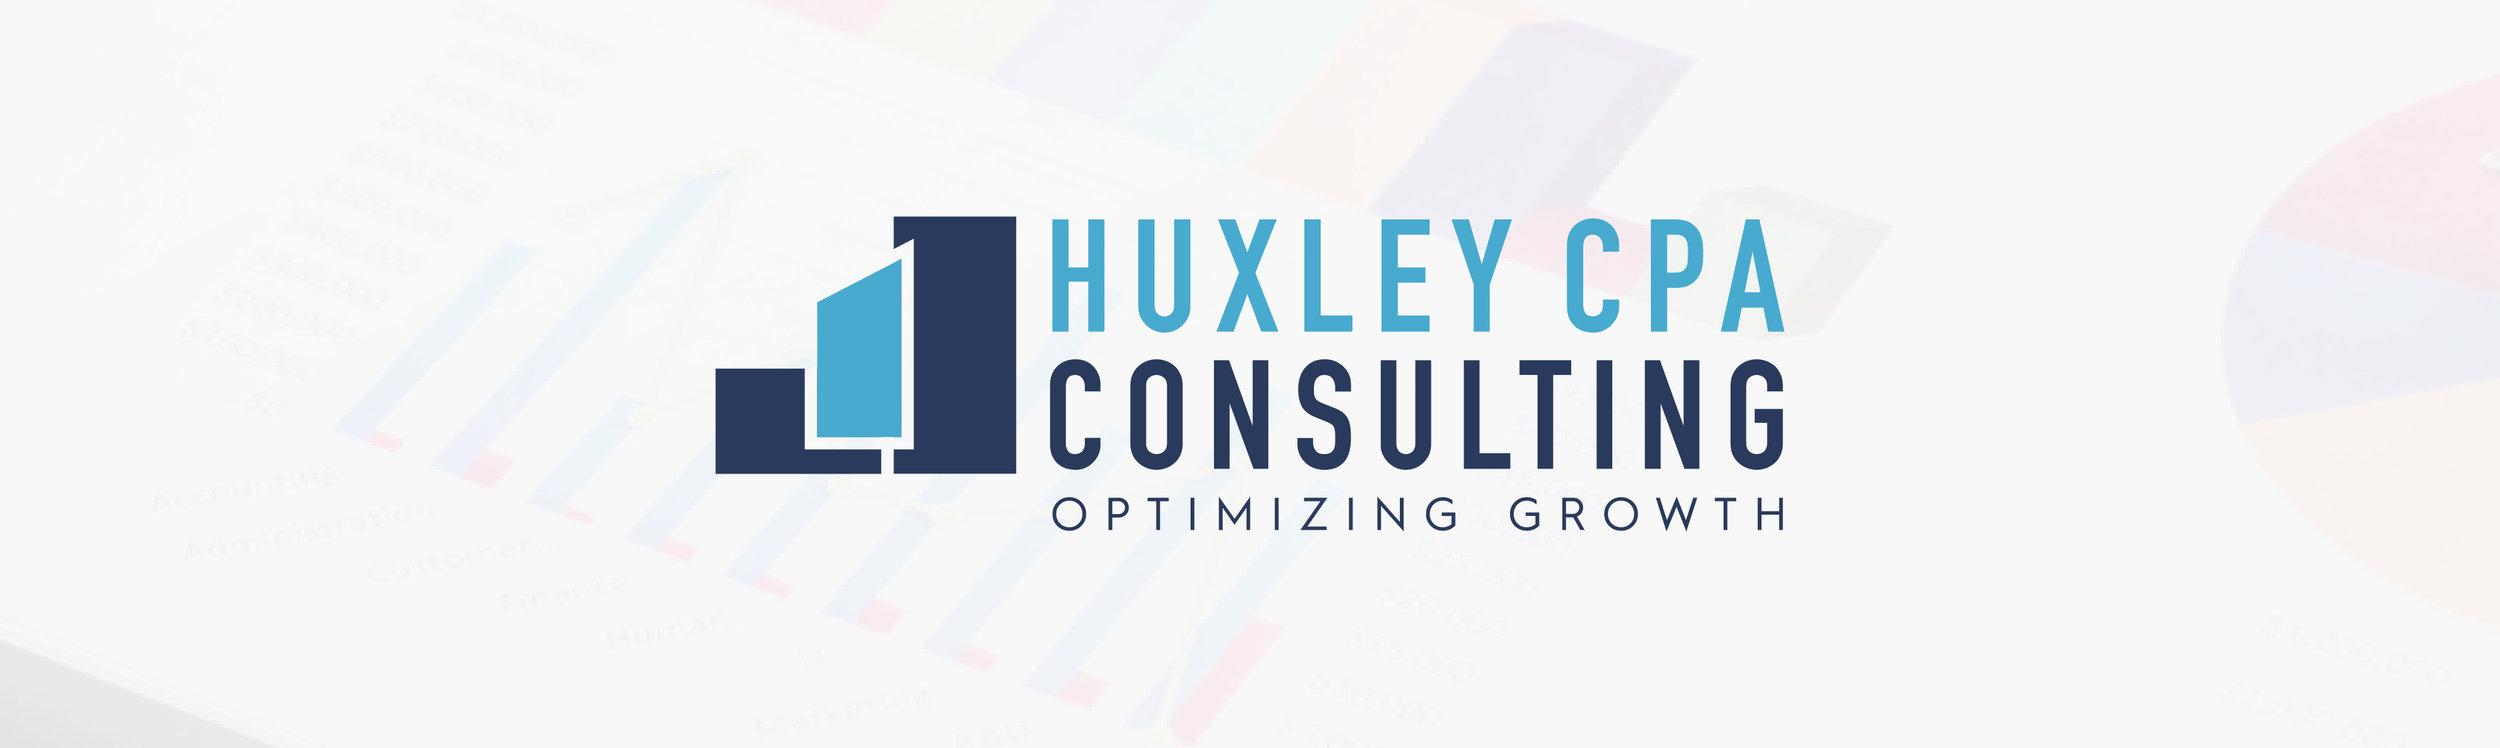 HUXLEY CPA   branding